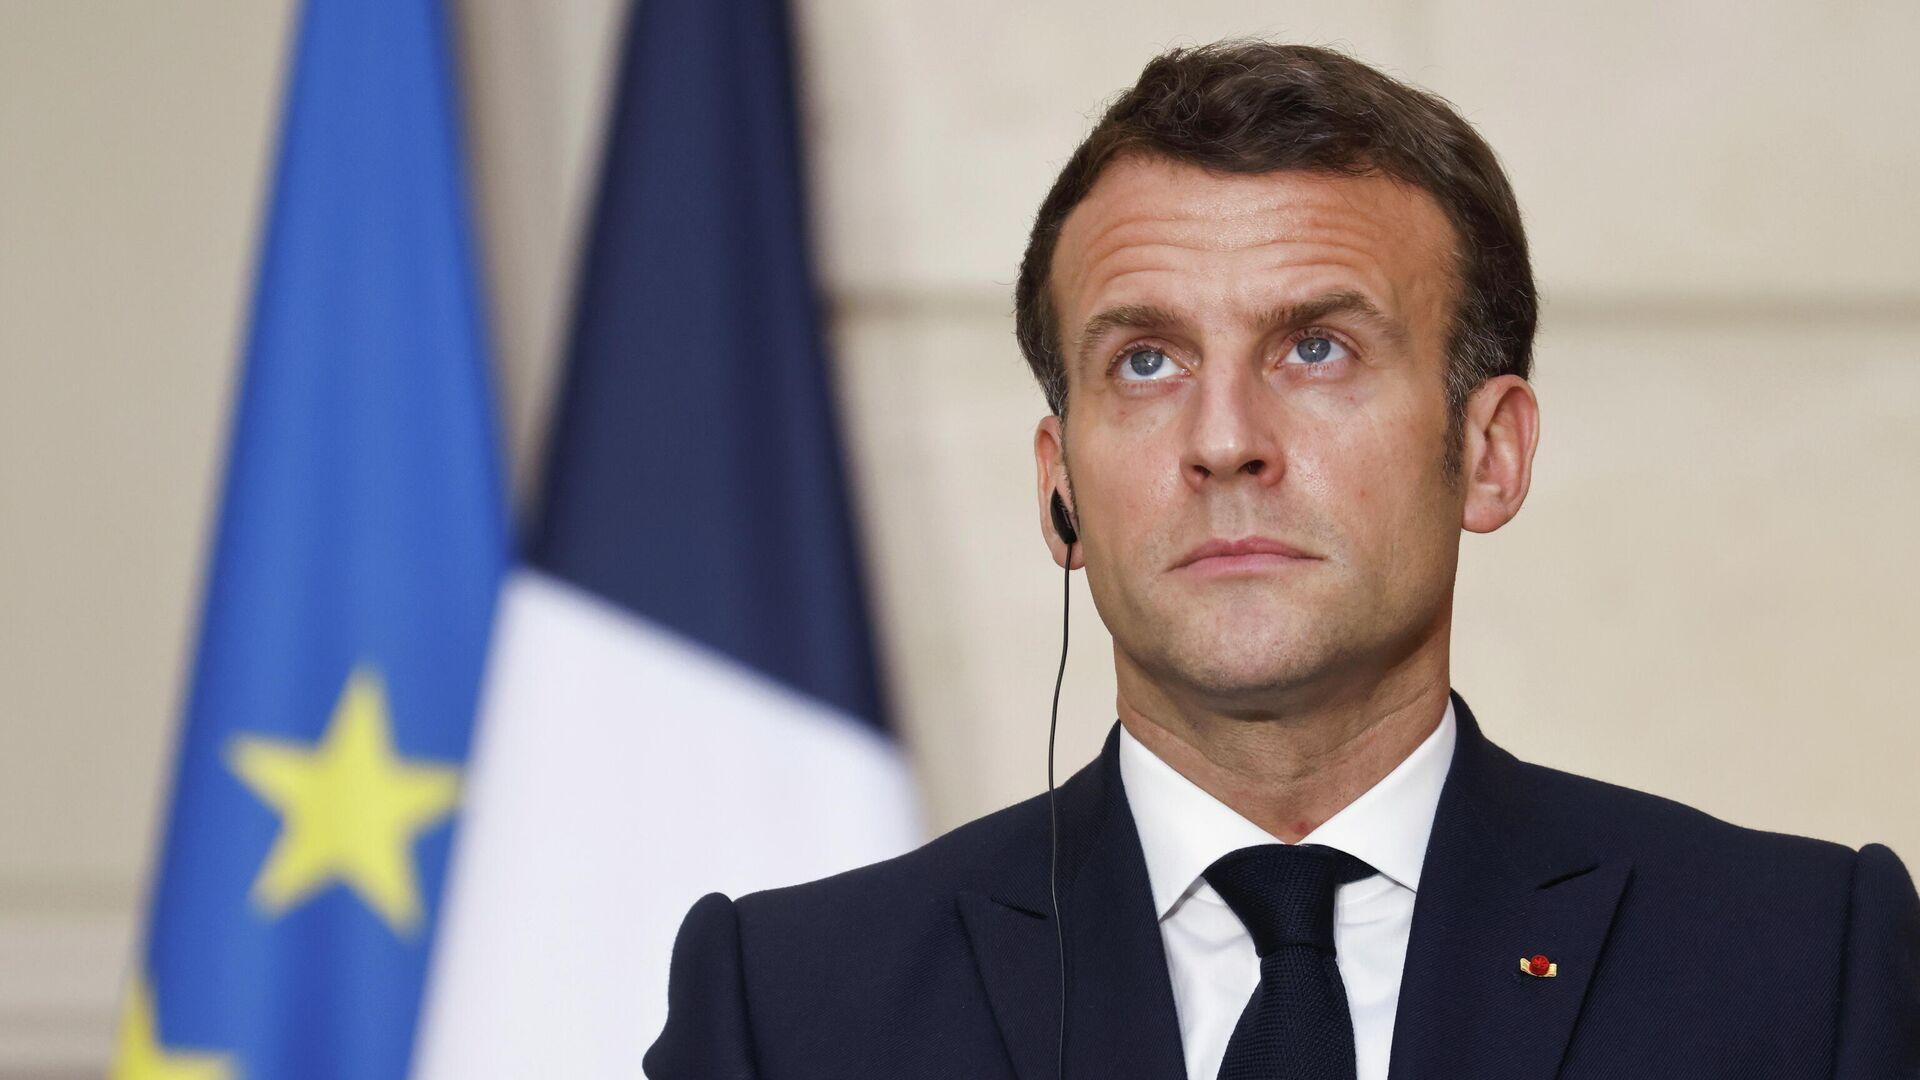 Emmanuel Macron, el presidente de Francia - Sputnik Mundo, 1920, 06.04.2021